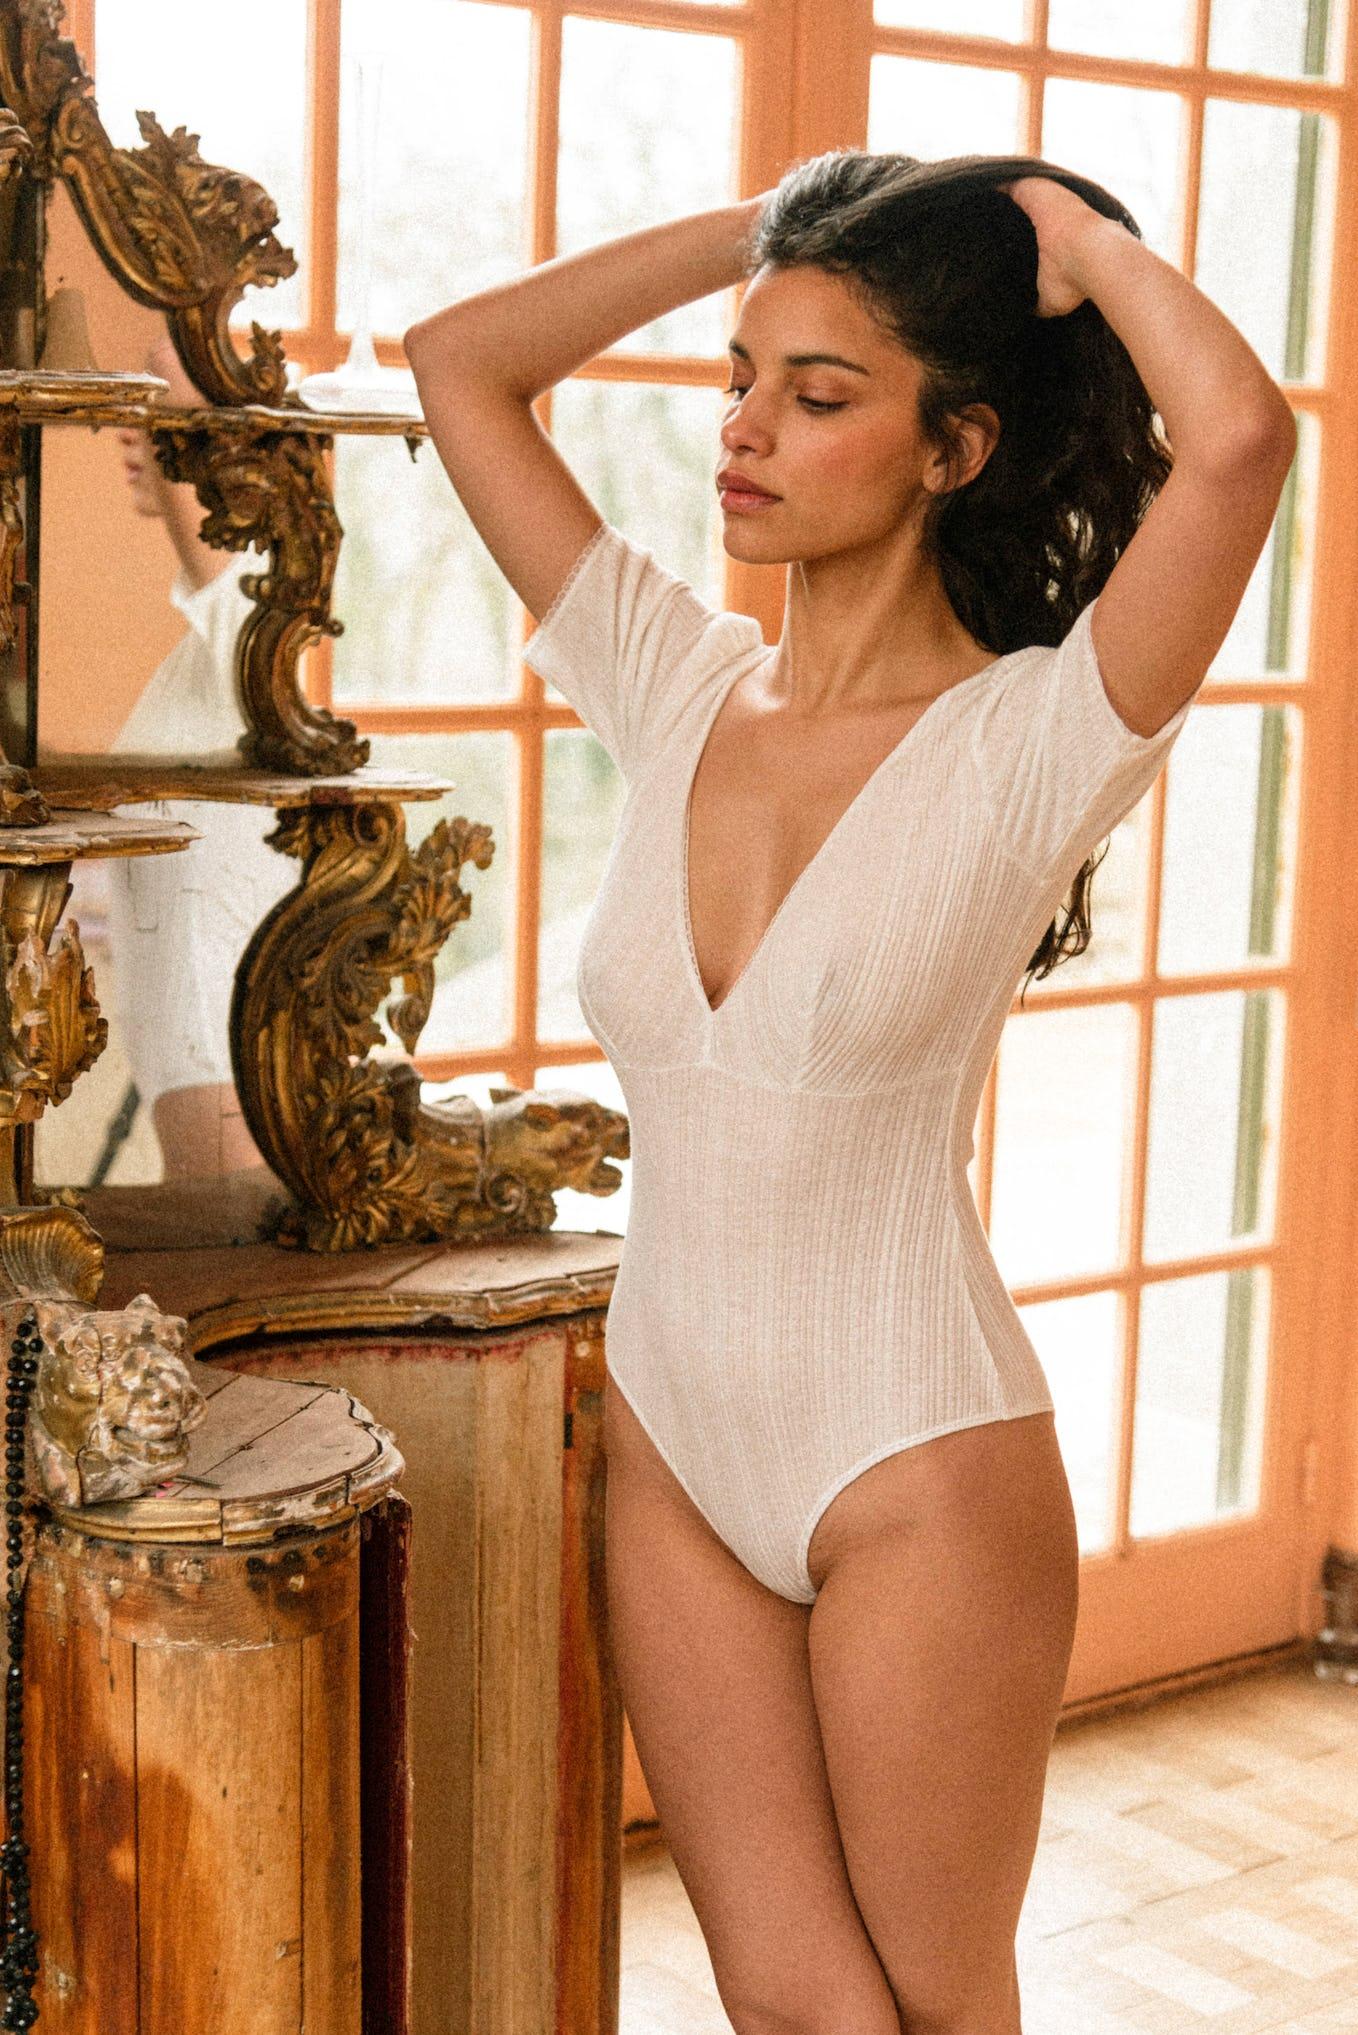 Tamara Bodysuit in ivory